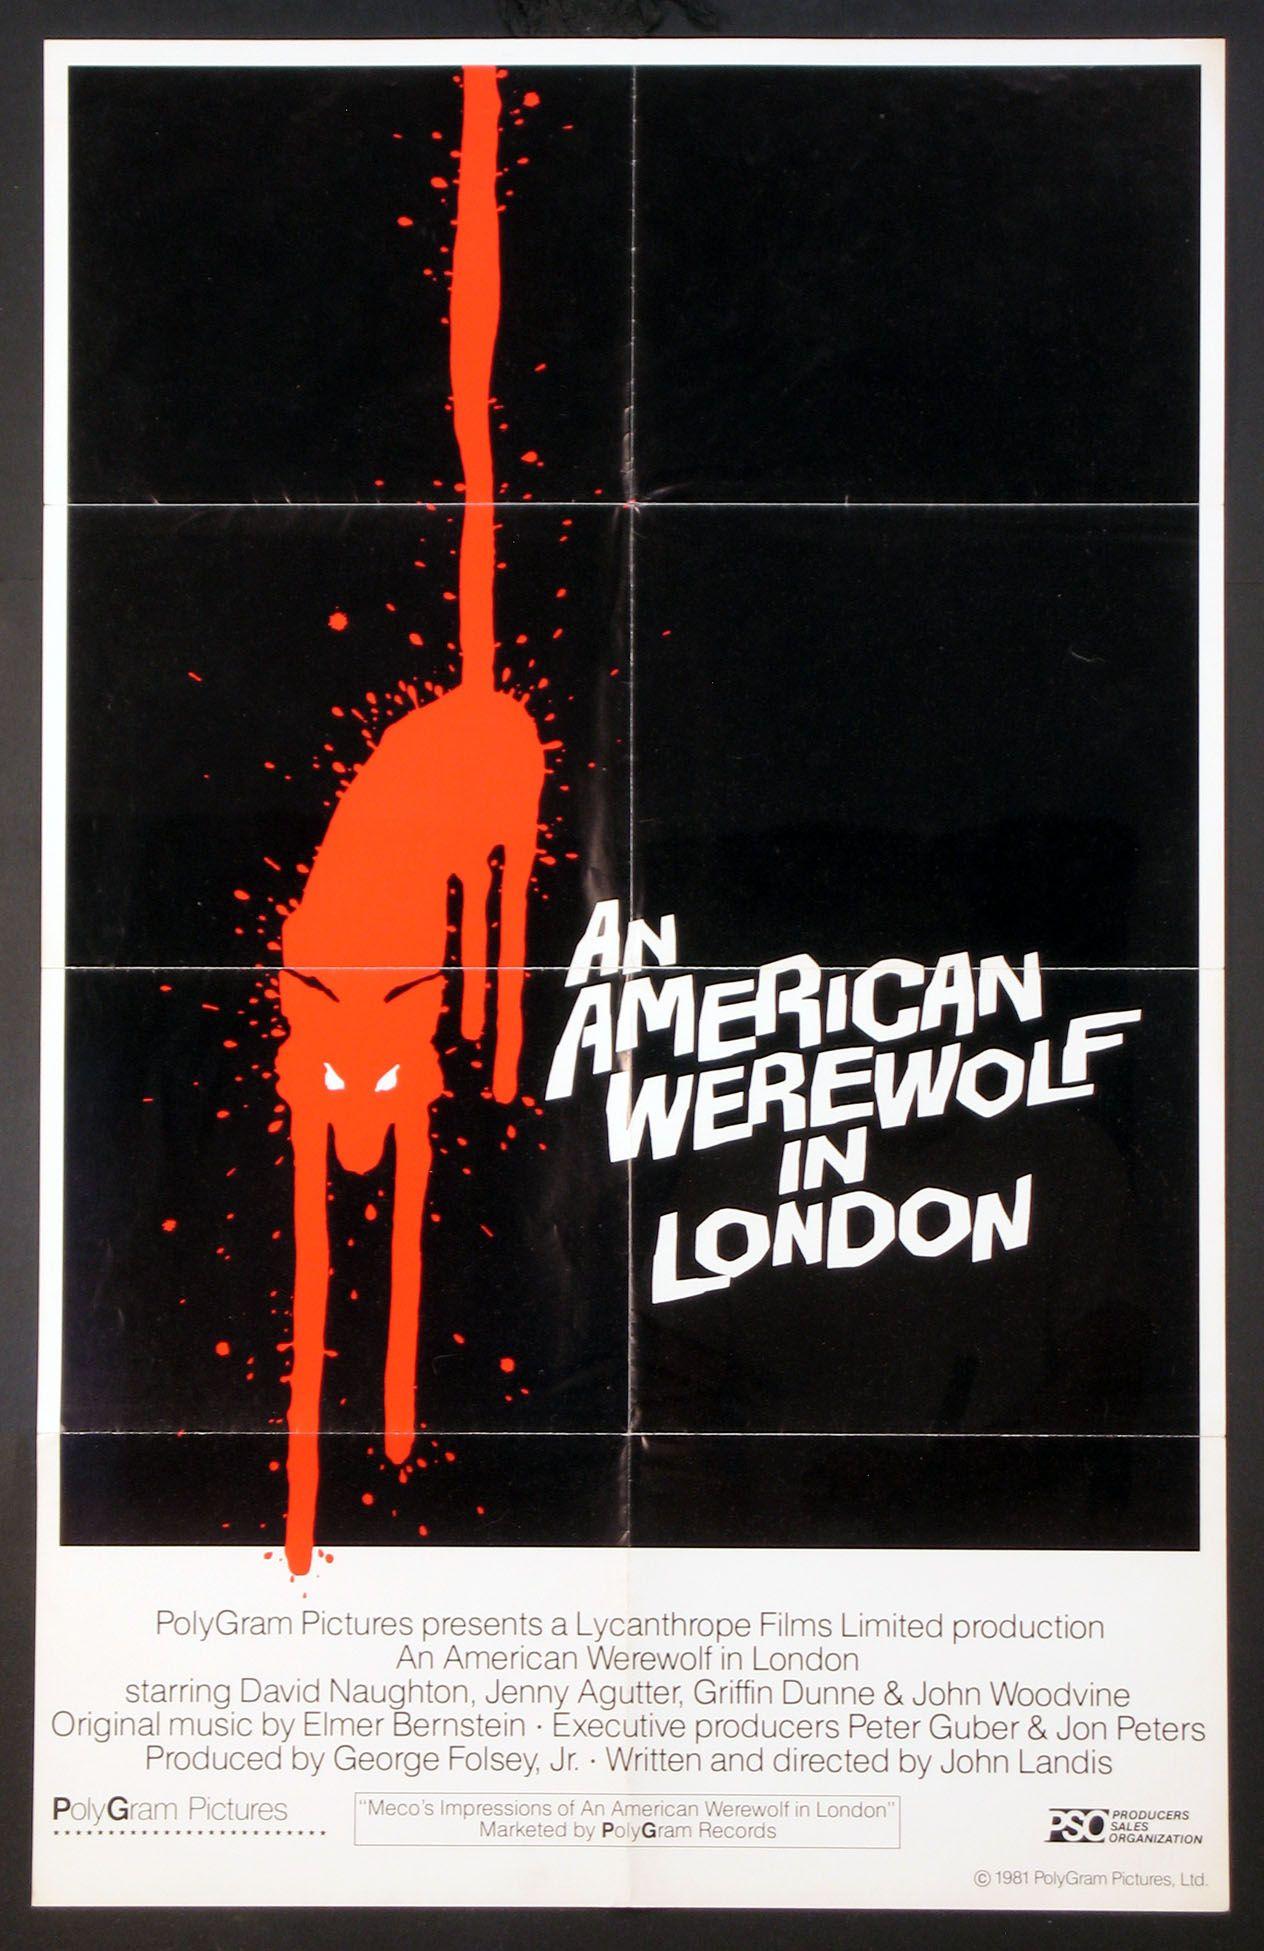 AN AMERICAN WEREWOLF IN LONDON (1981) Original one sheet